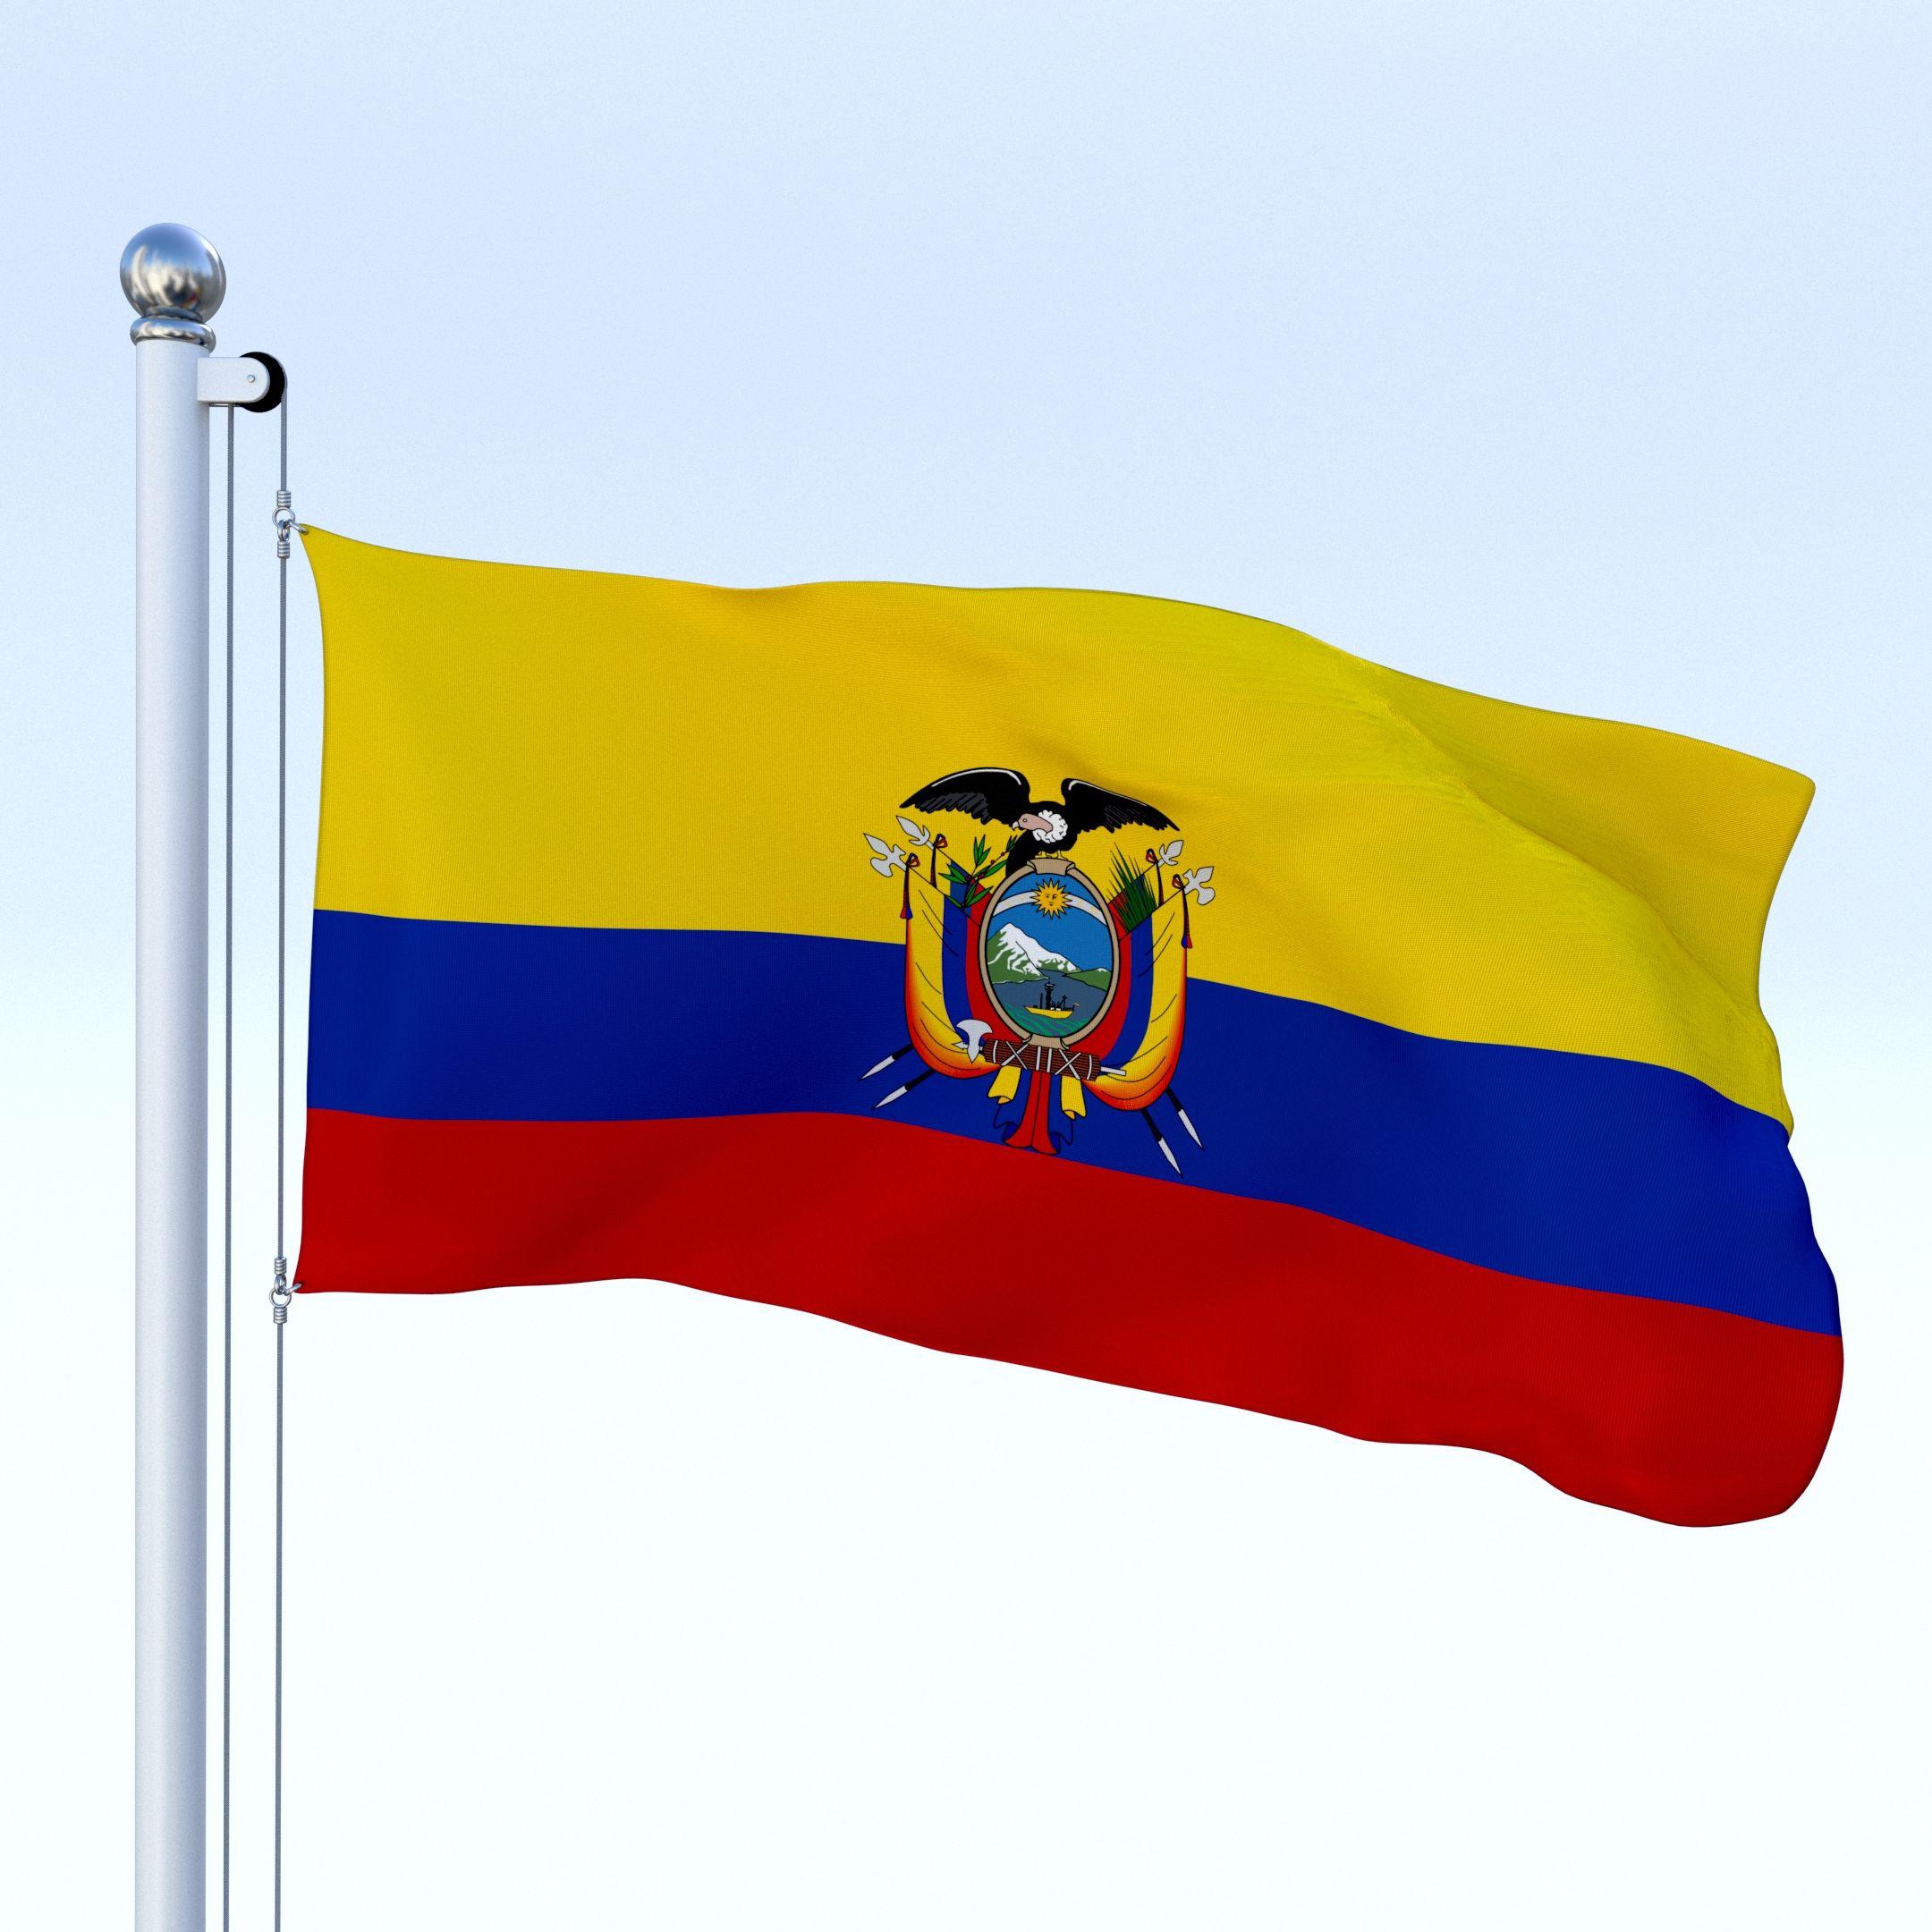 Animated Ecuador Flag Ecuador flag, Animation, Flag